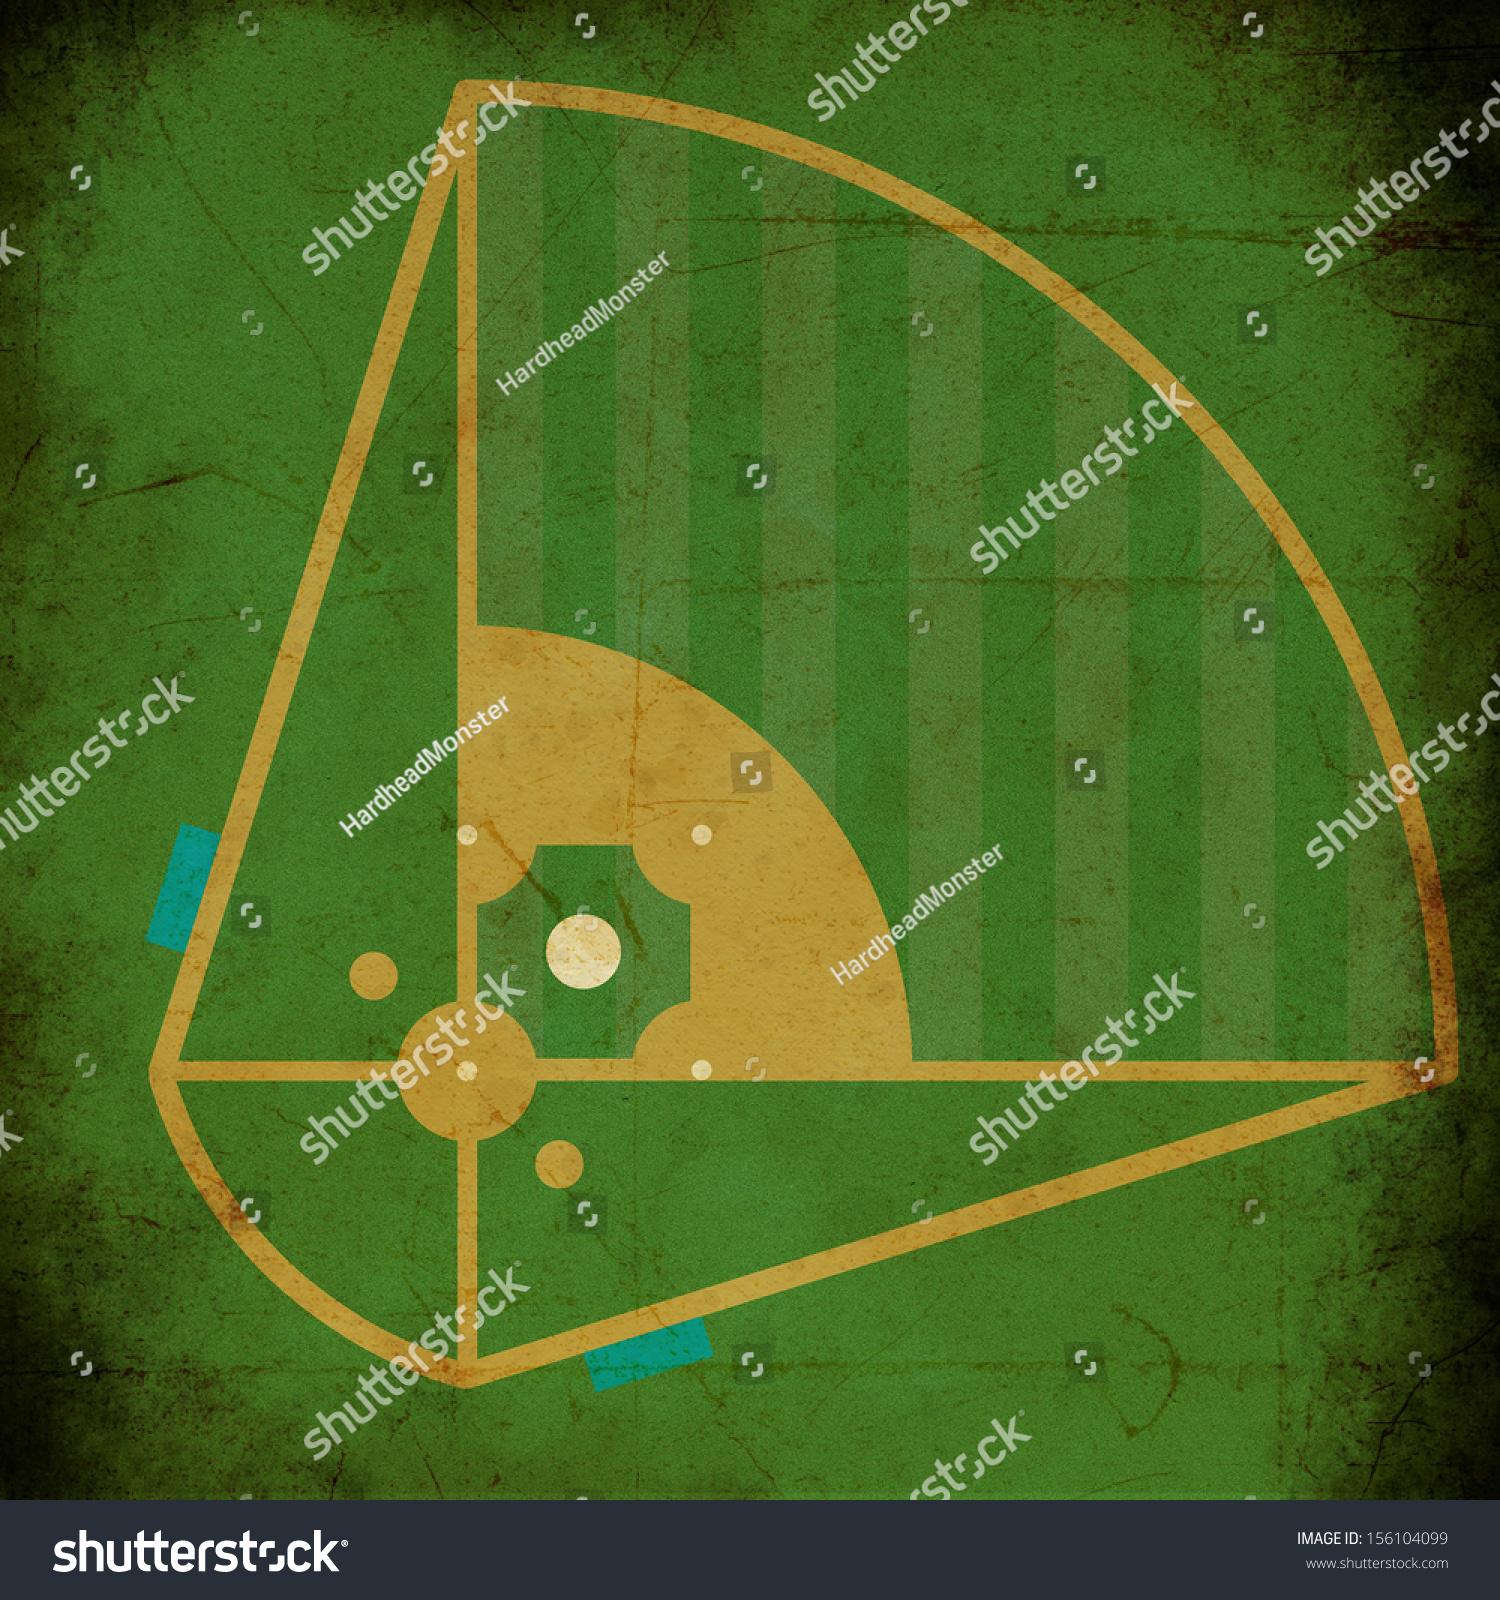 texture vintage background baseball field design stock